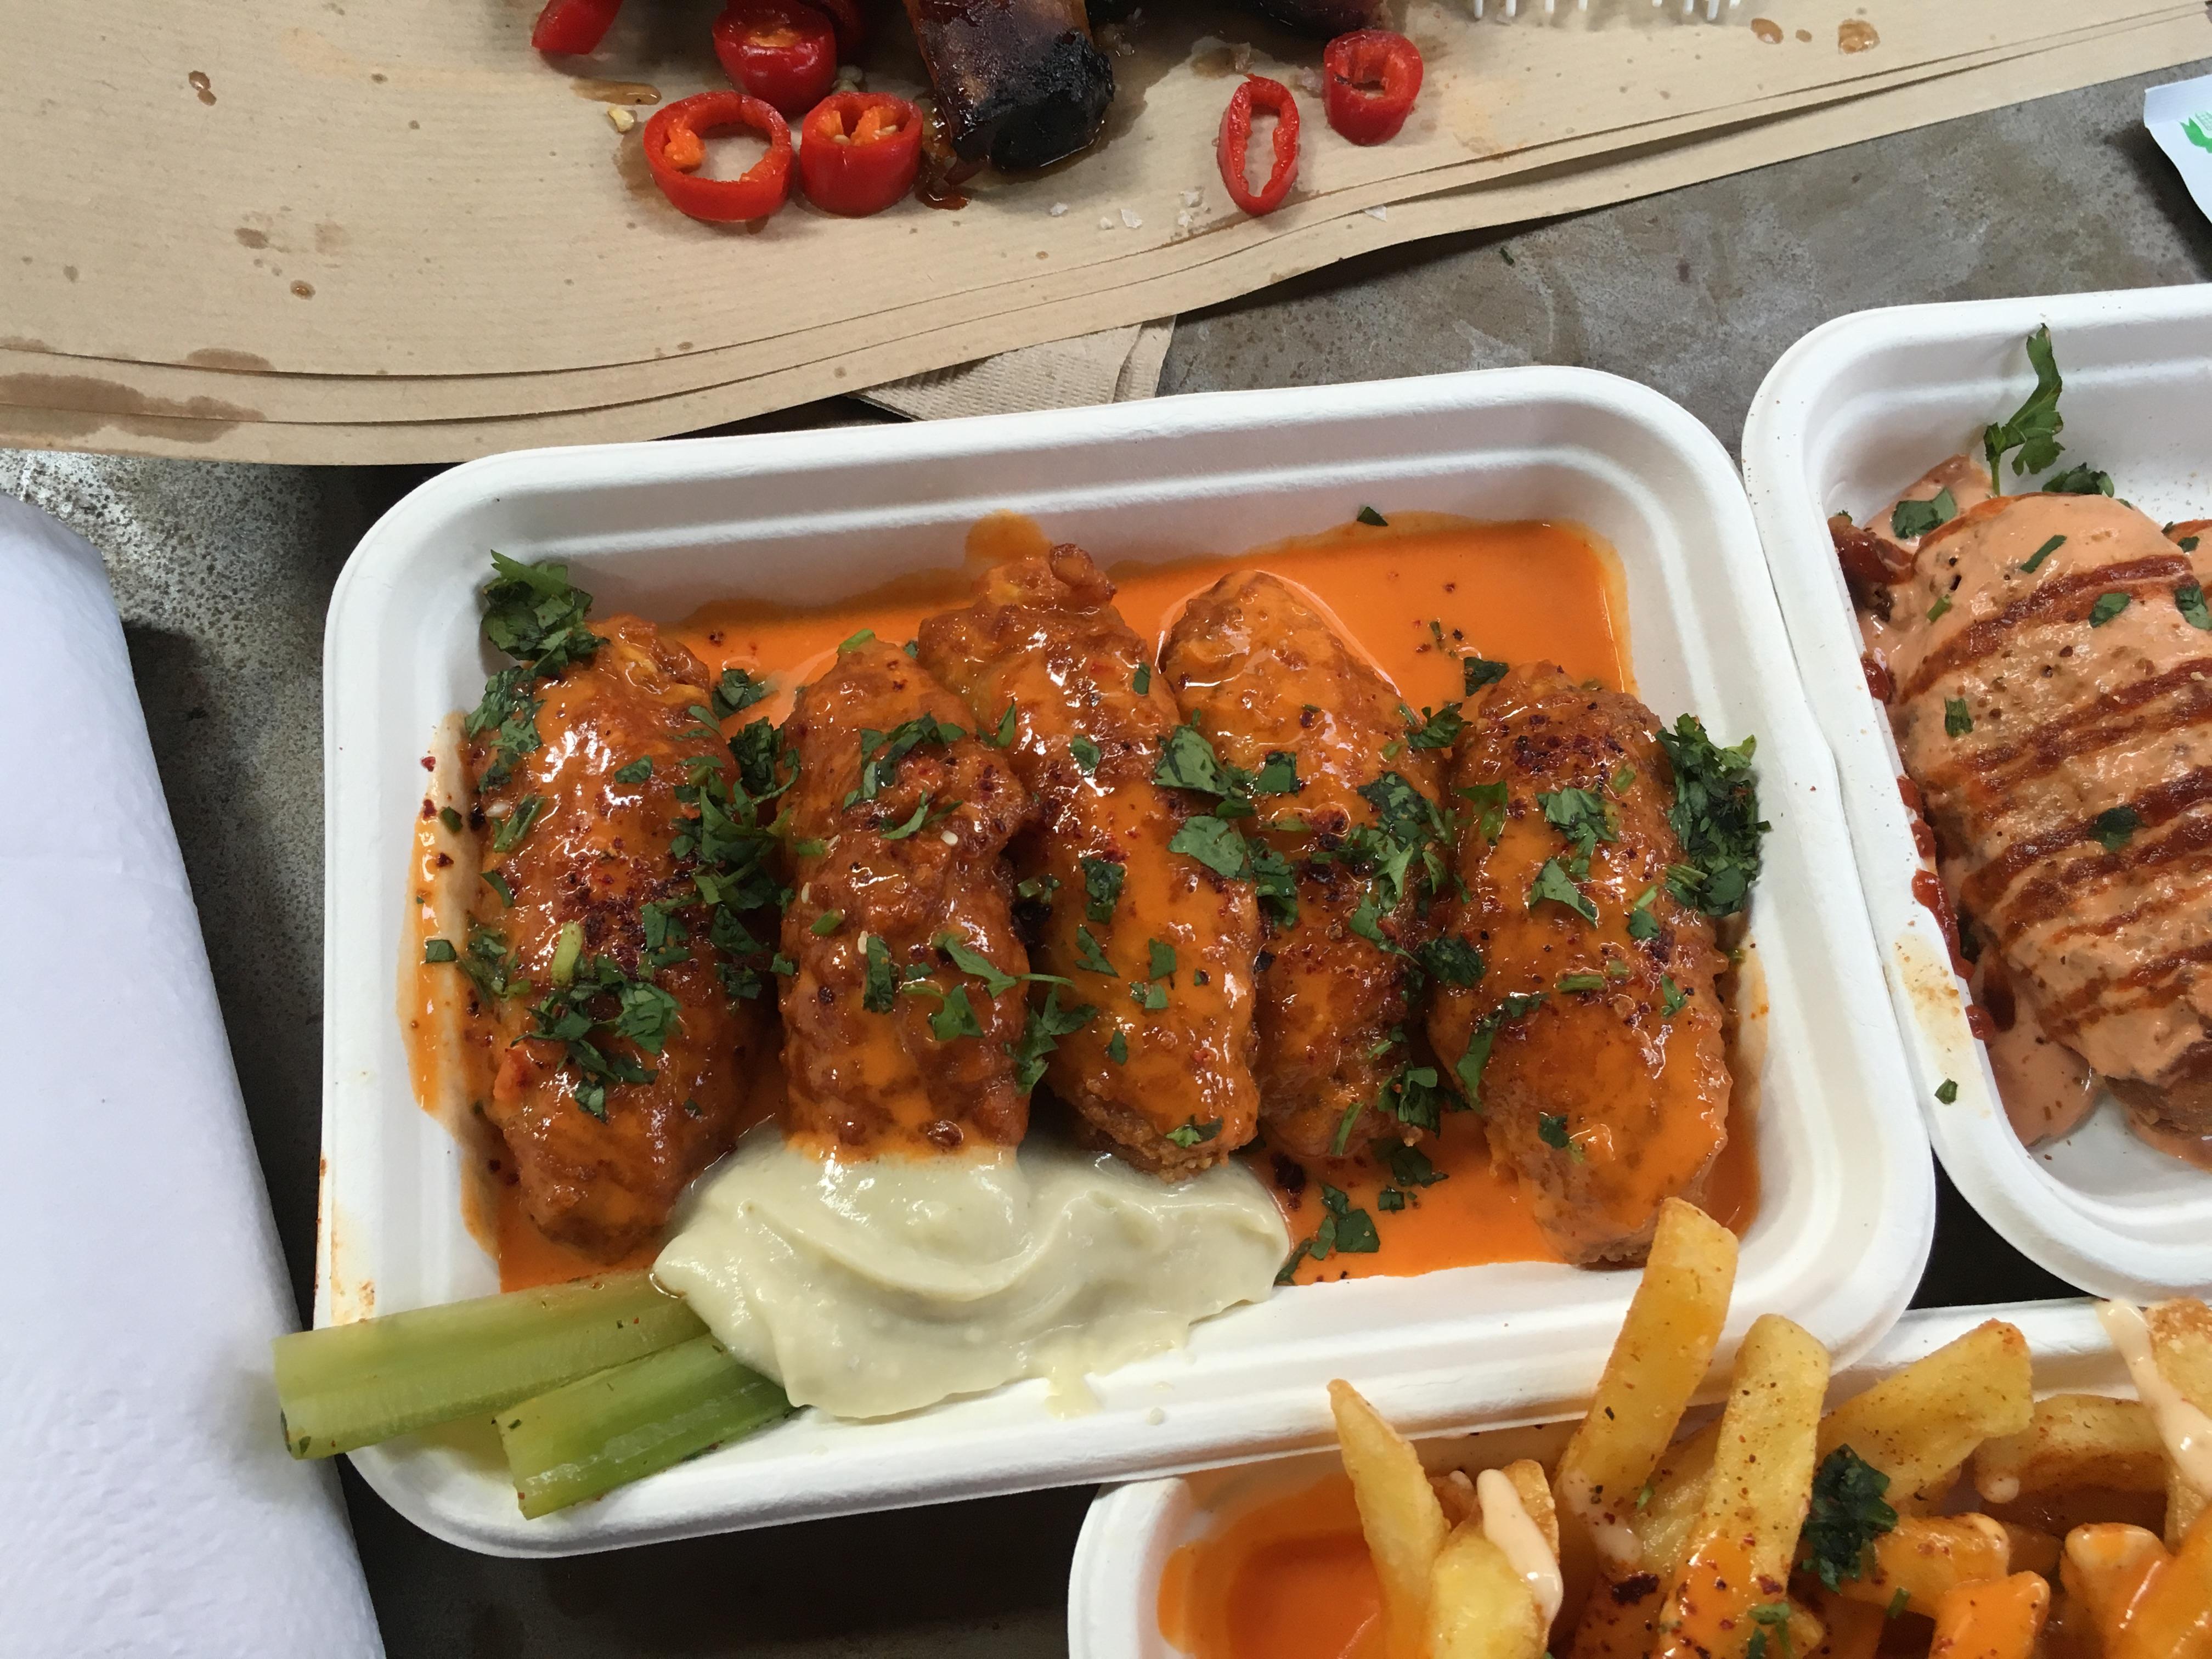 LondonsDiningCouple Street Feast Dinerama Review | Top 10 Restaurants in London 2017